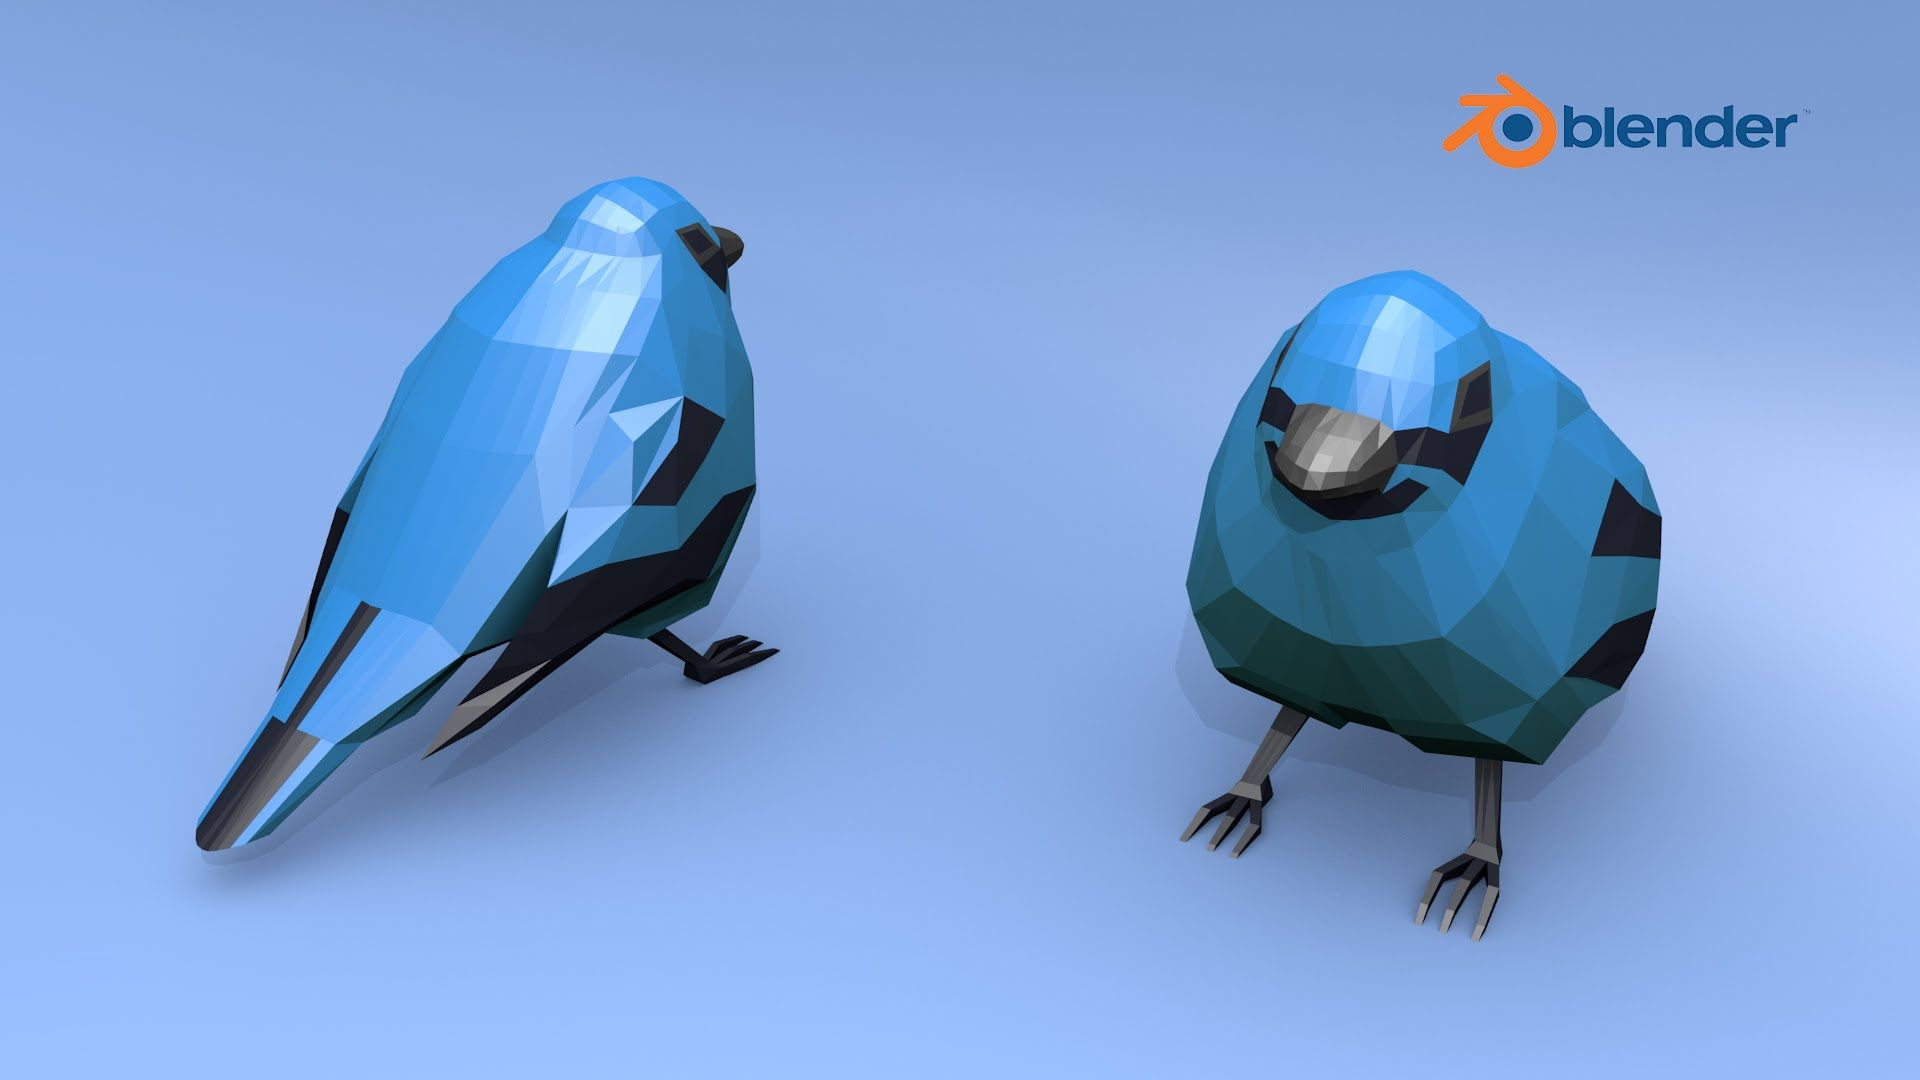 Blender demo low poly bird speed design blender pinterest blender demo low poly bird speed design baditri Choice Image